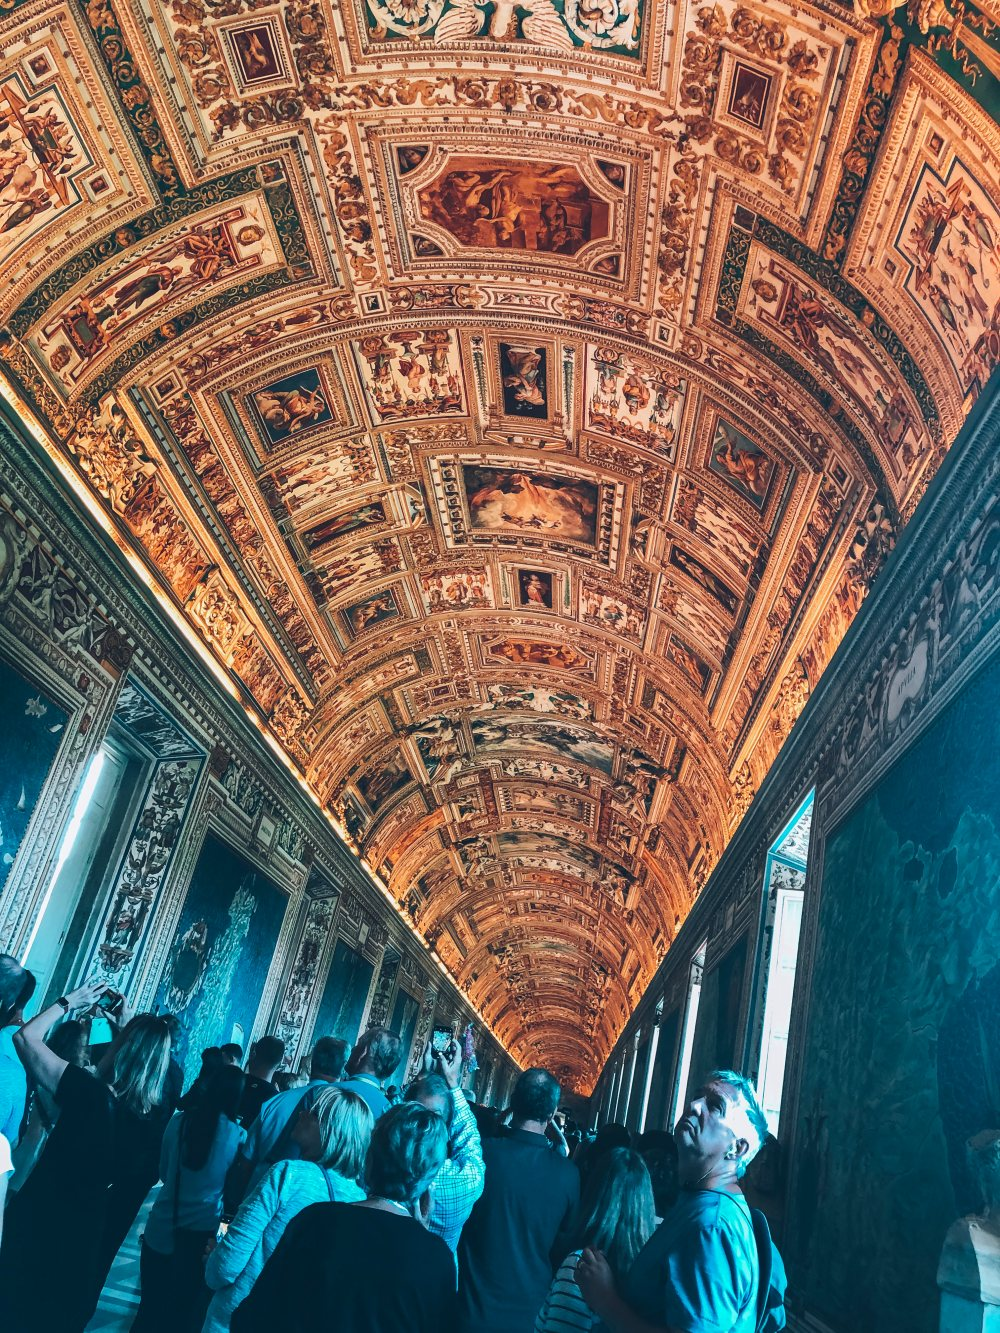 vatikaani-museo-rooma-vatican-rime